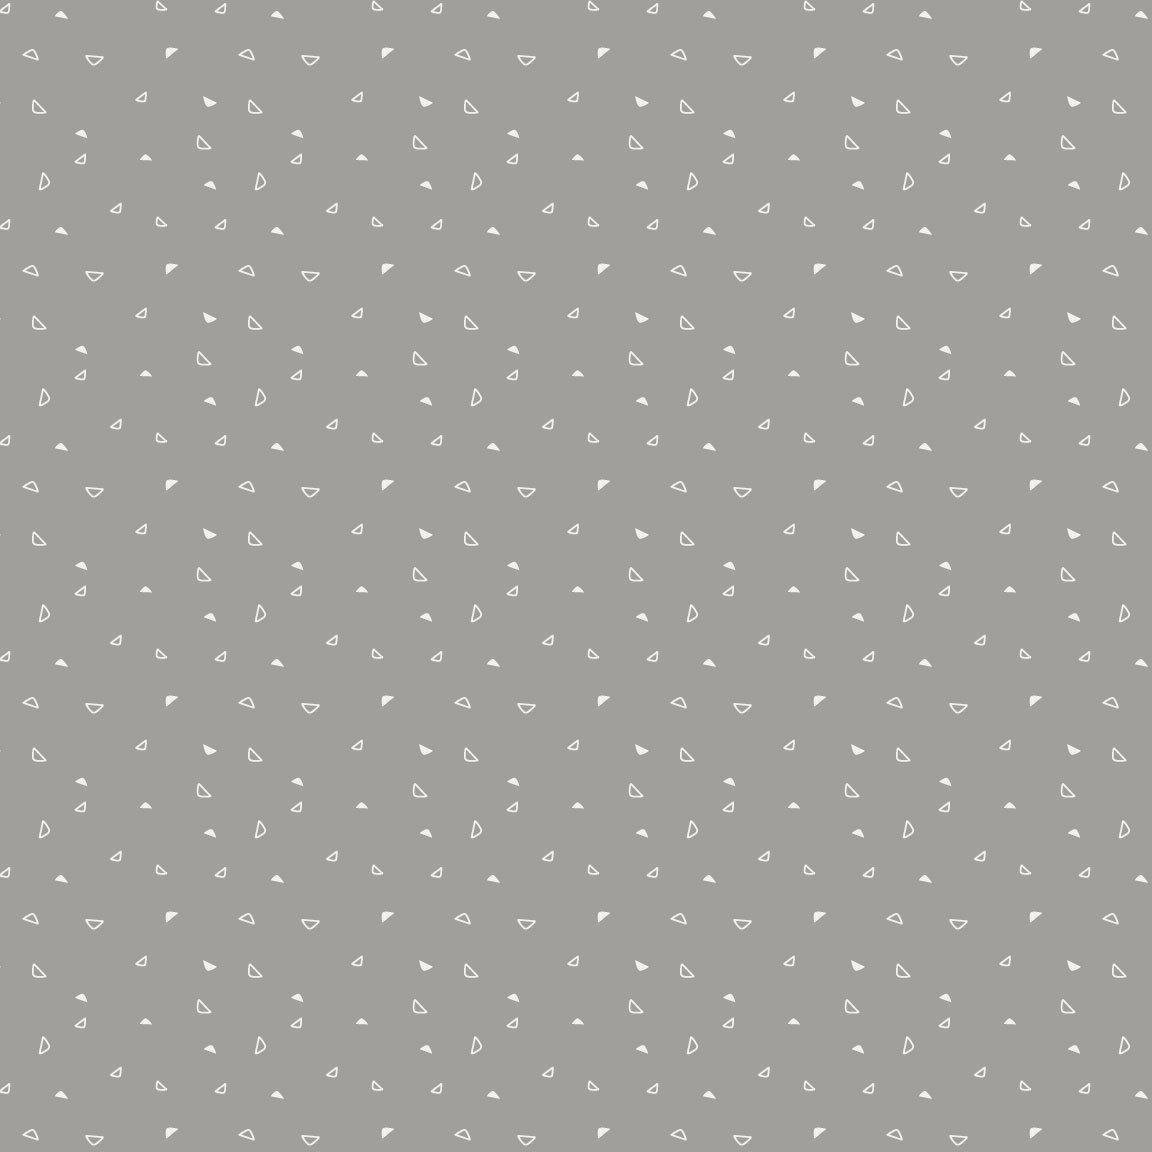 Blenders - Medium Grey - 108